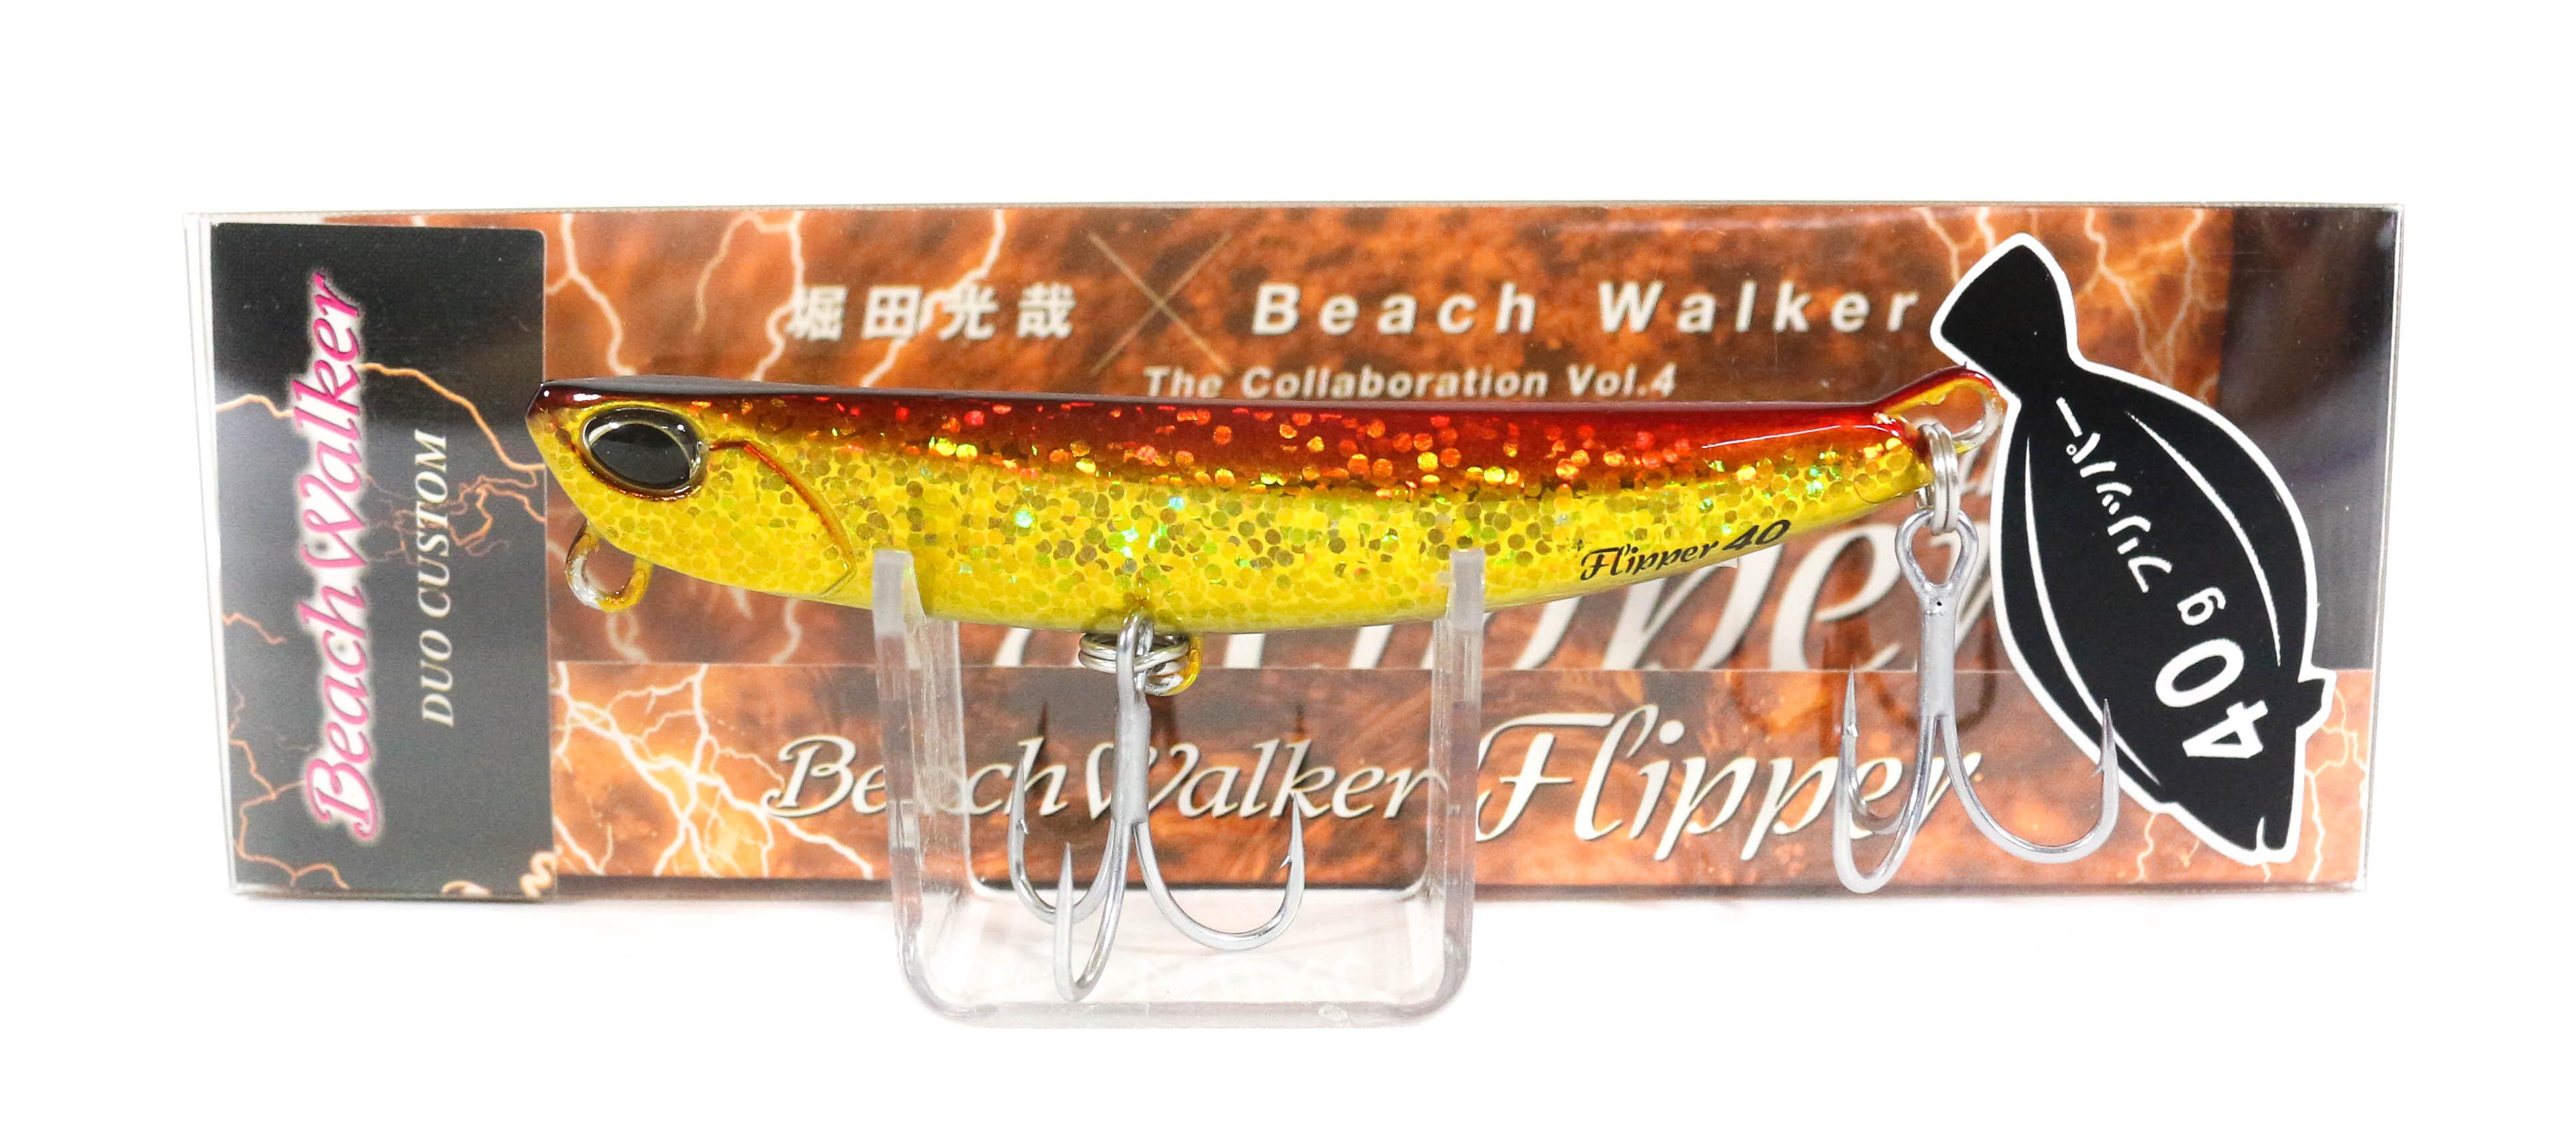 Duo Beach Walker Flipper 40 grams Sinking Lure GOA0026 (3953)